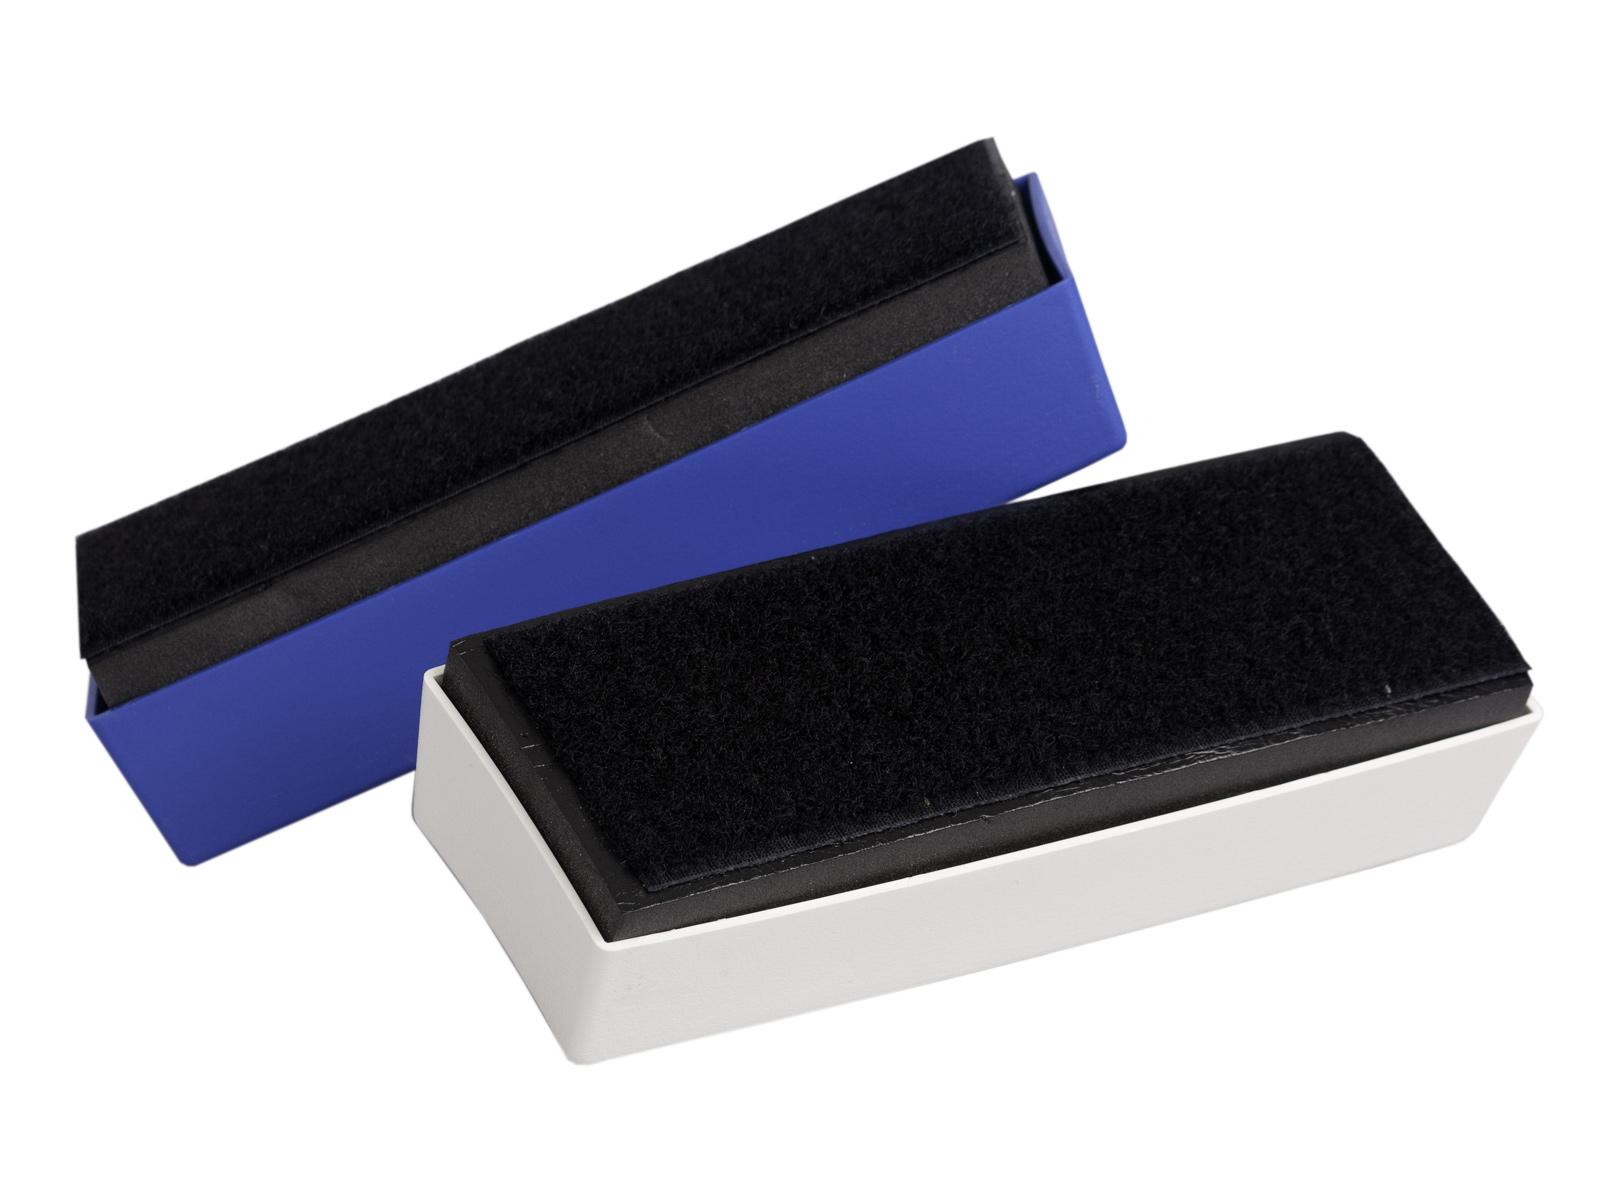 Blackboard clipart whiteboard duster Eraser Board Eraser Clipart Board